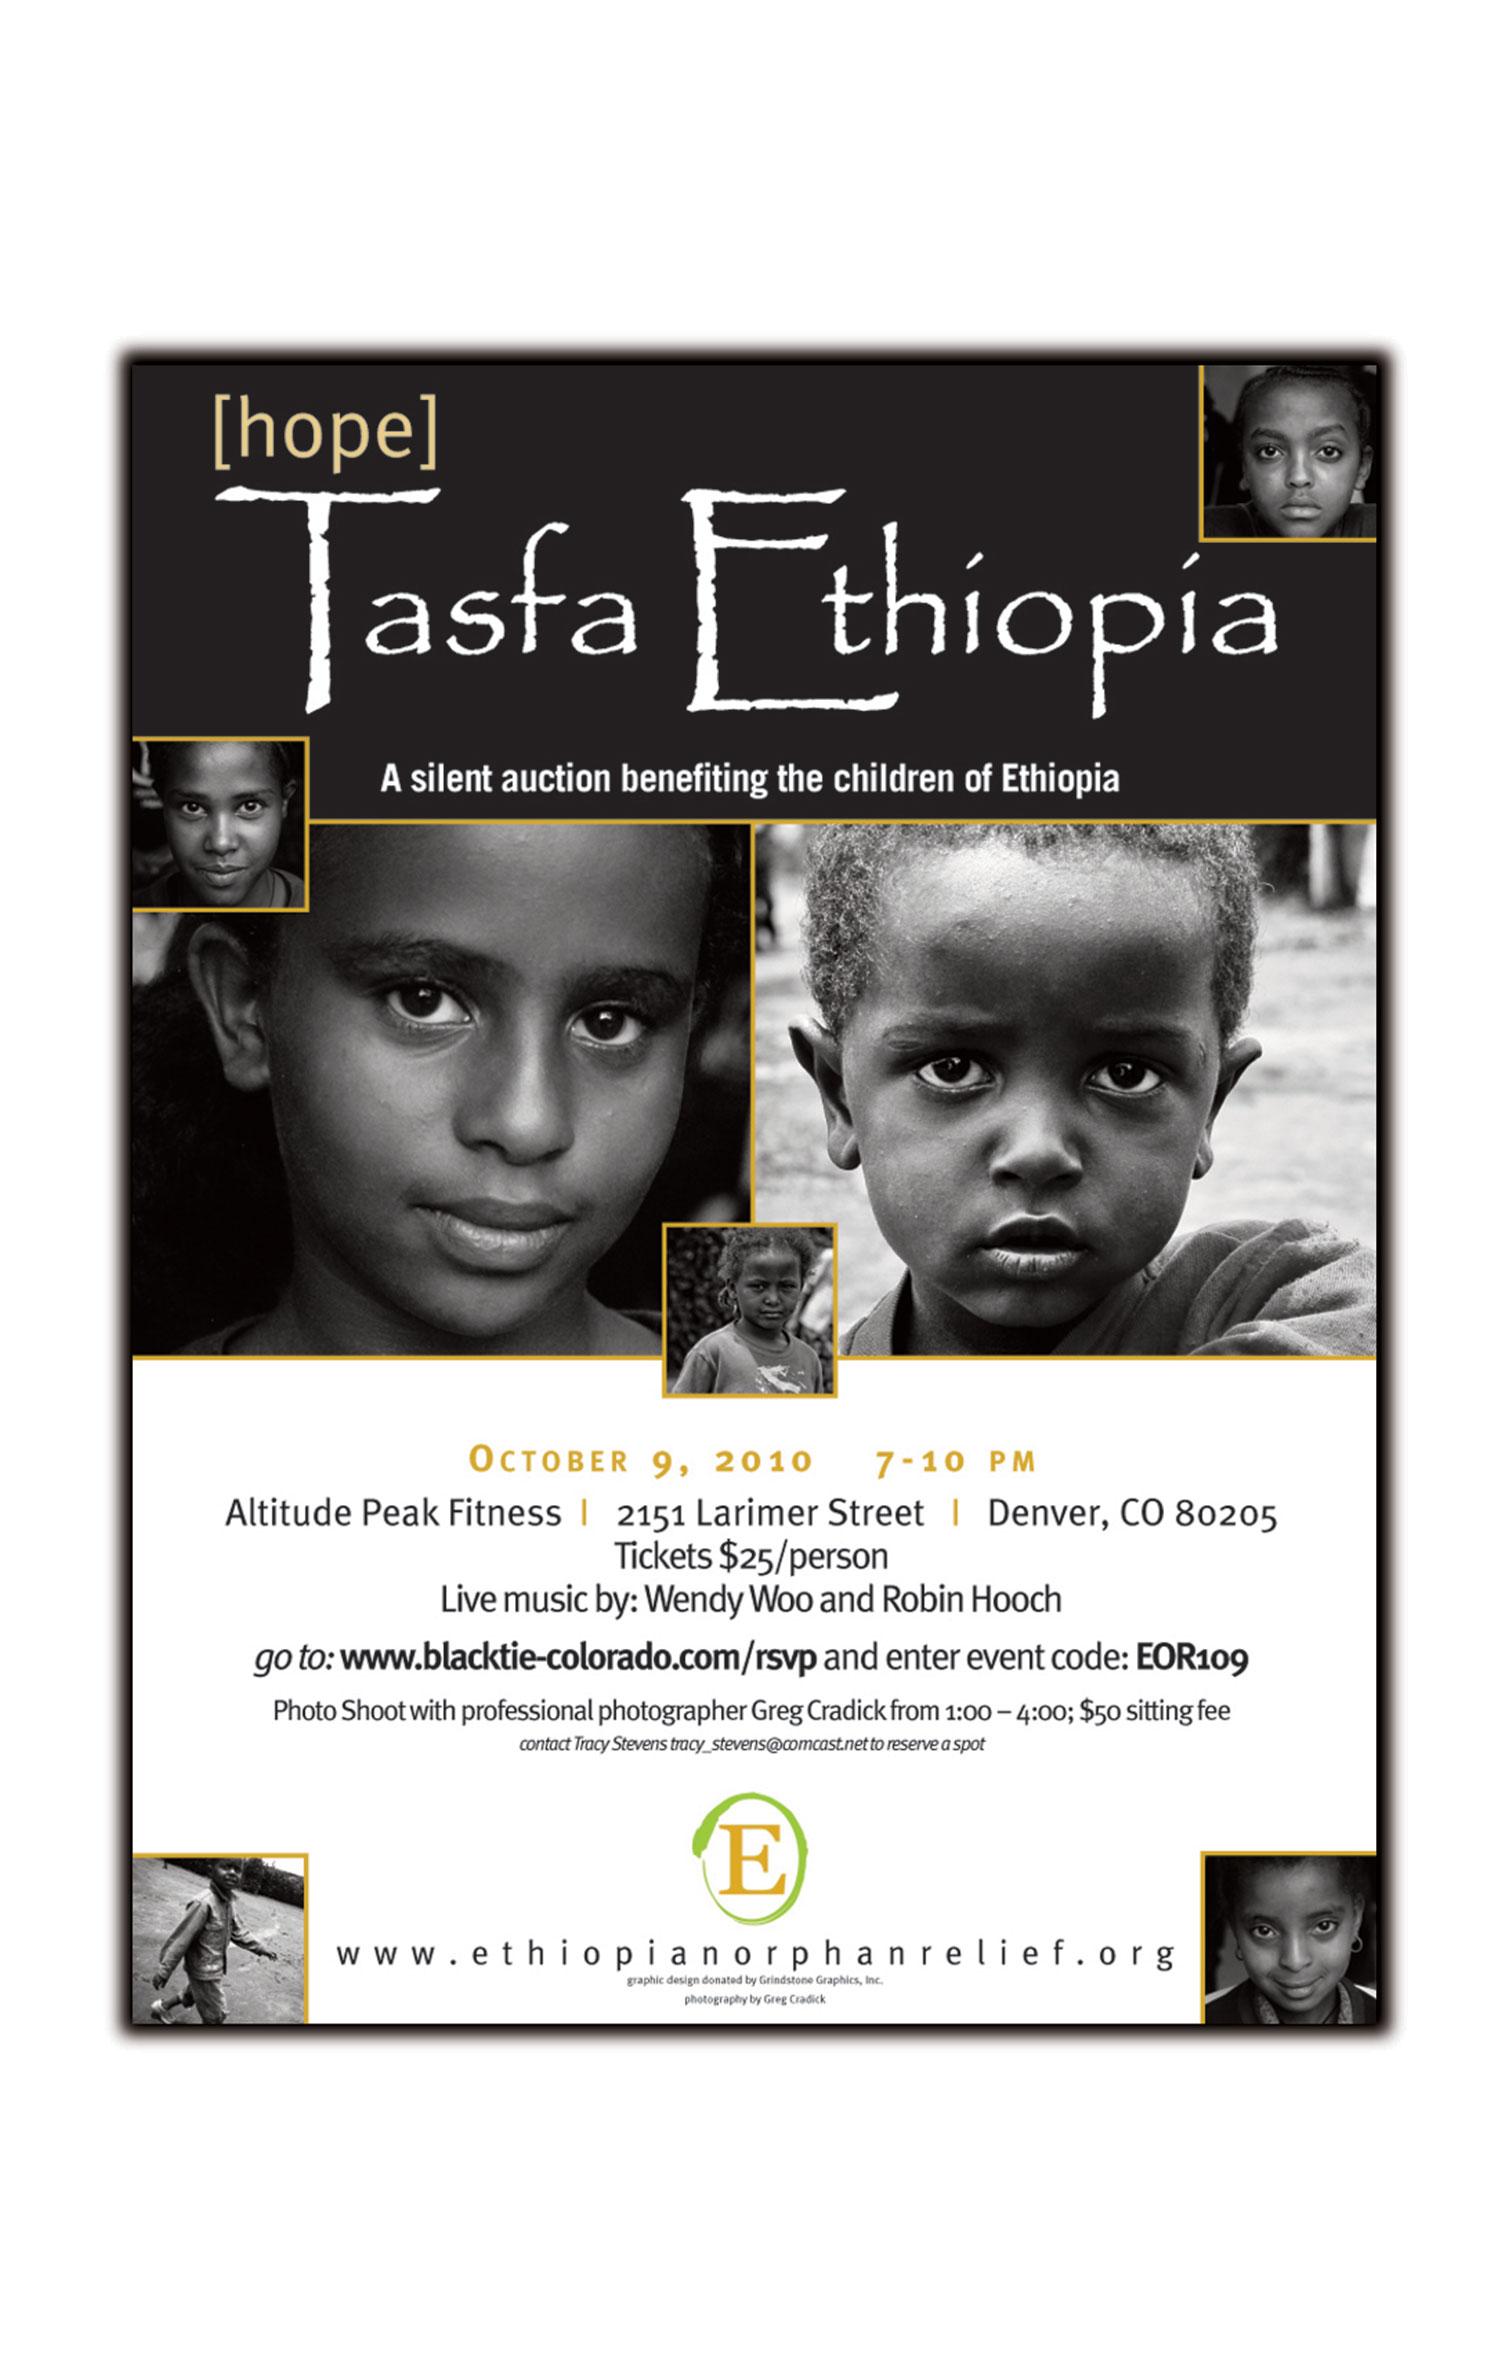 Ethiopian Orphan Relief